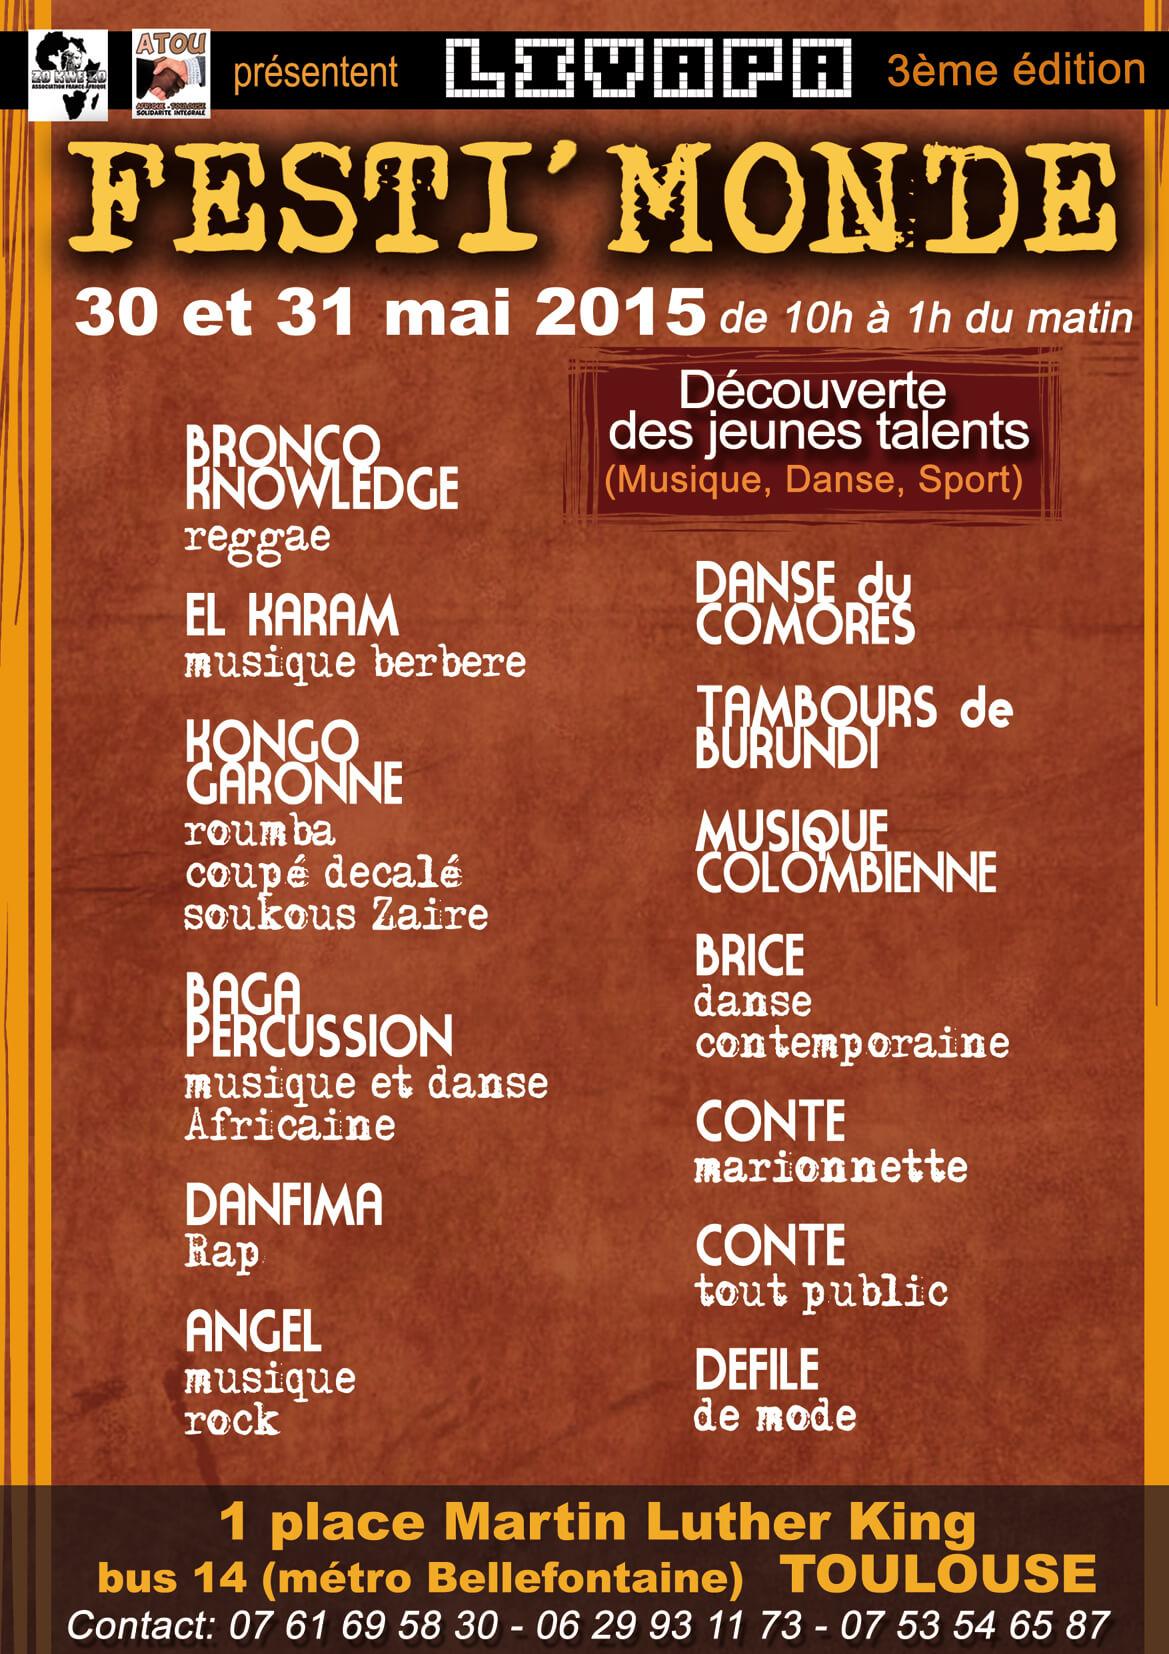 Arasia Festi Monde 2